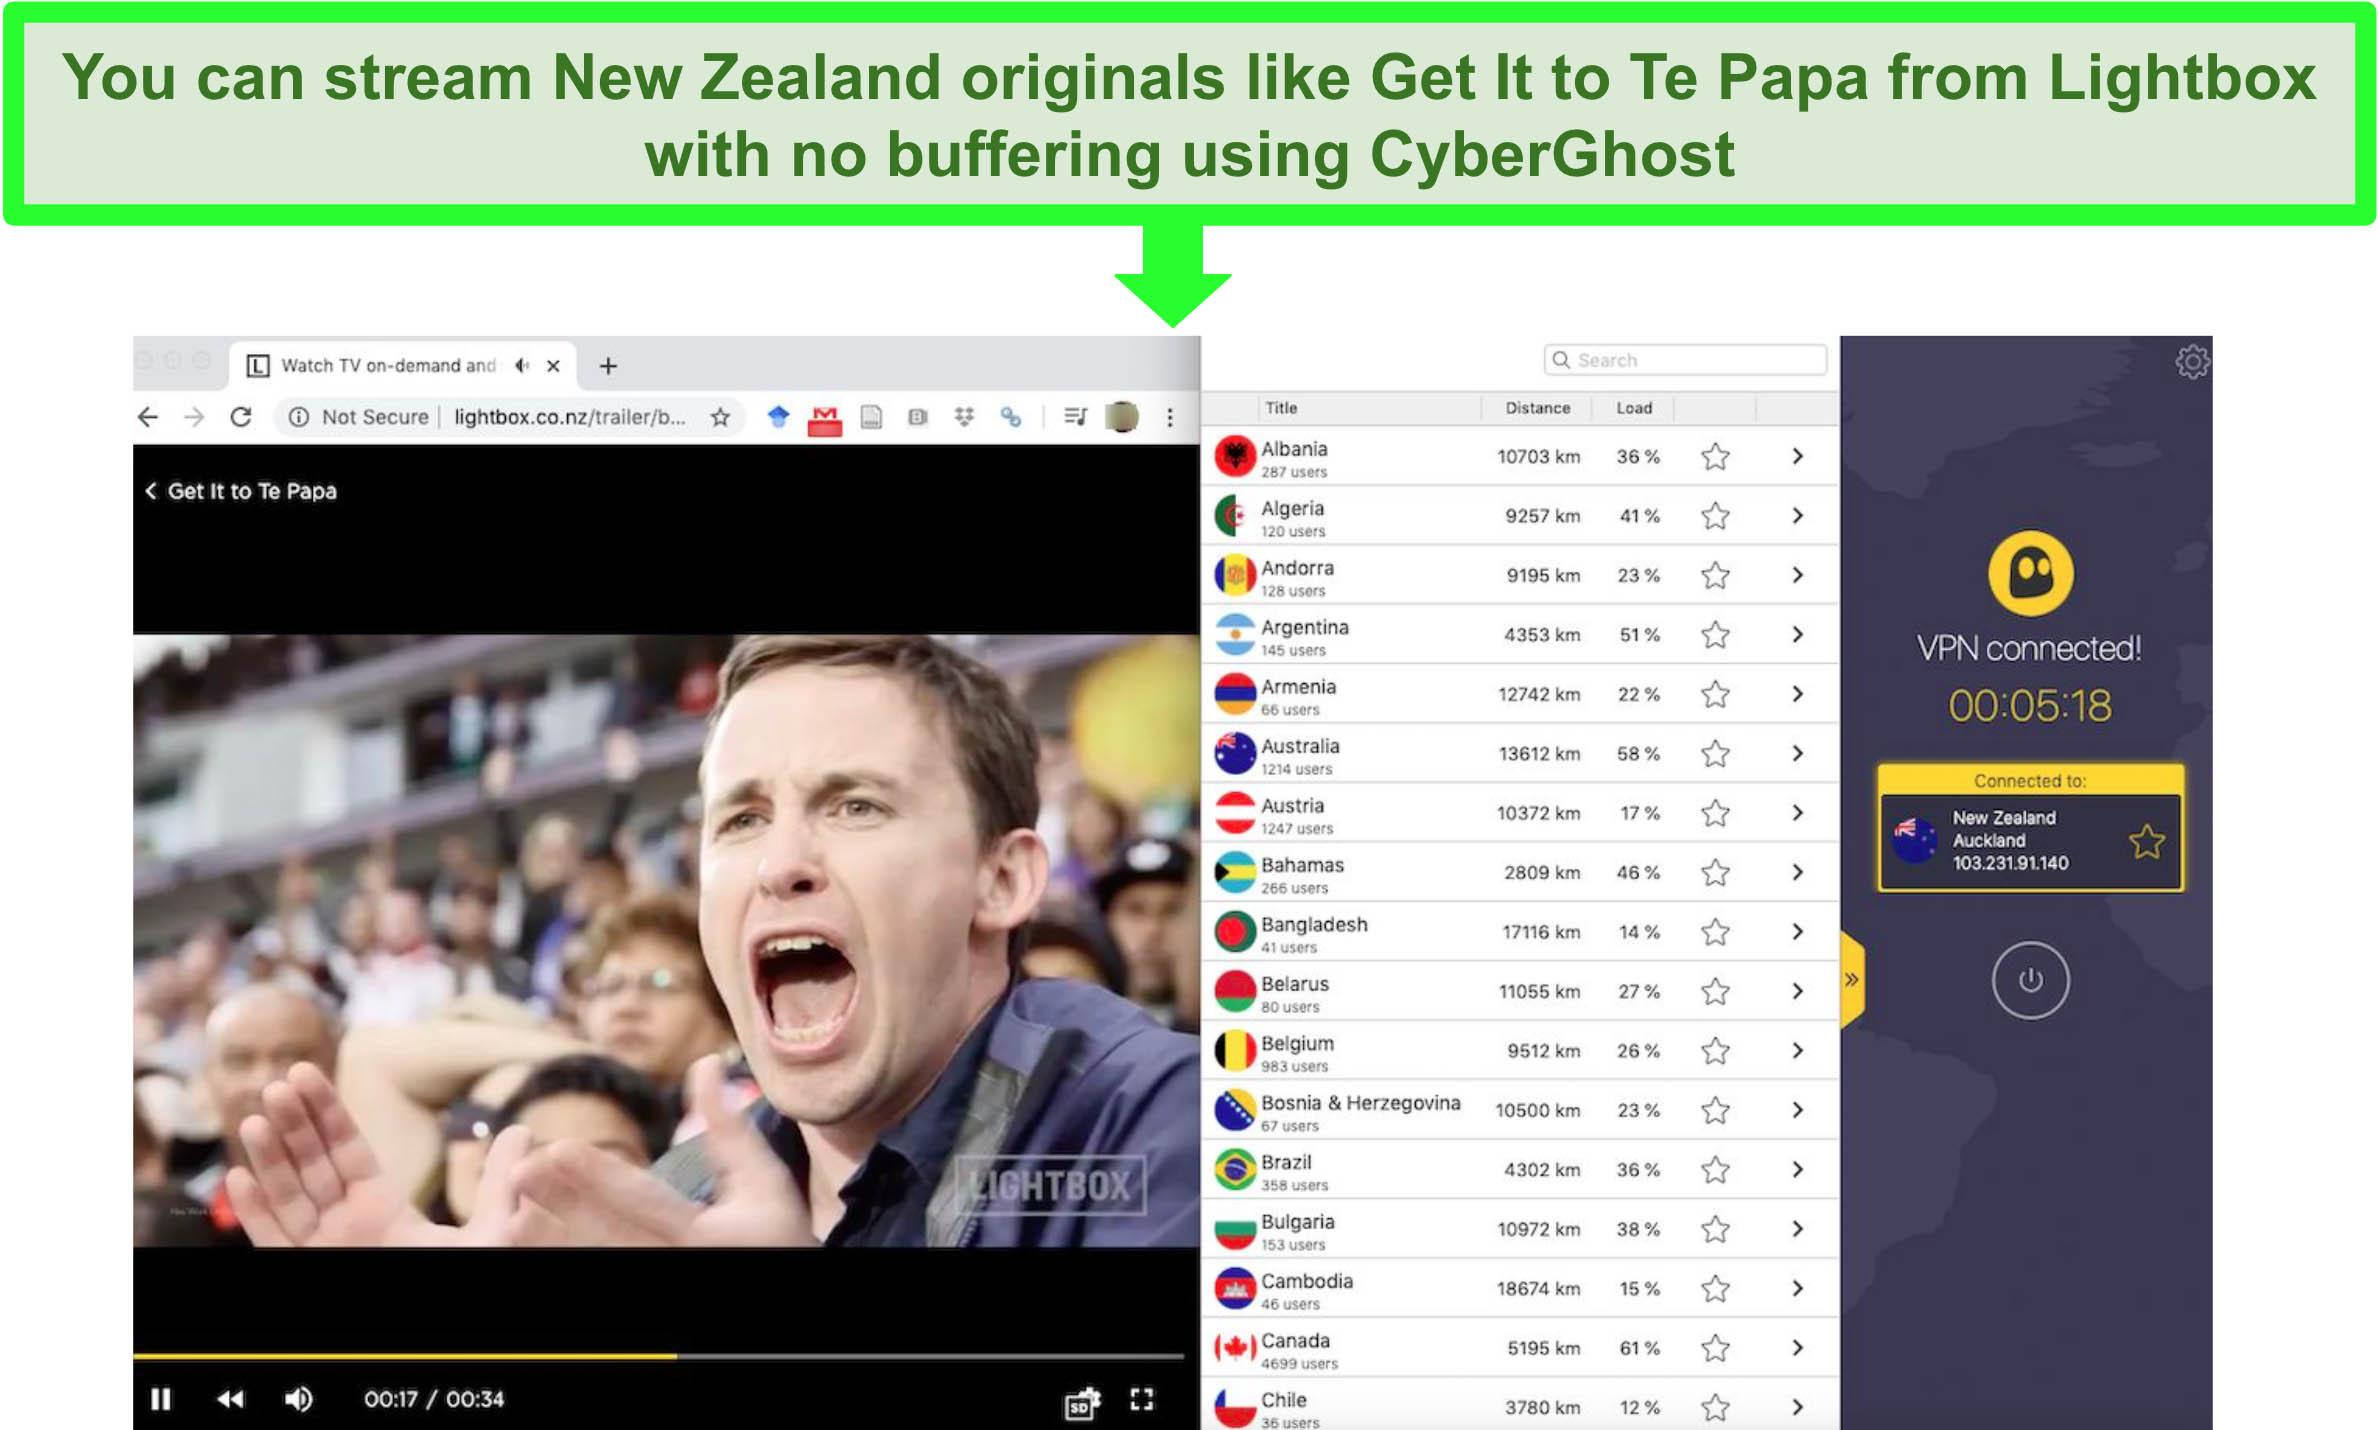 Screenshot of CyberGhost streaming an episode of the New Zealand Lightbox original Get It Te Papa.